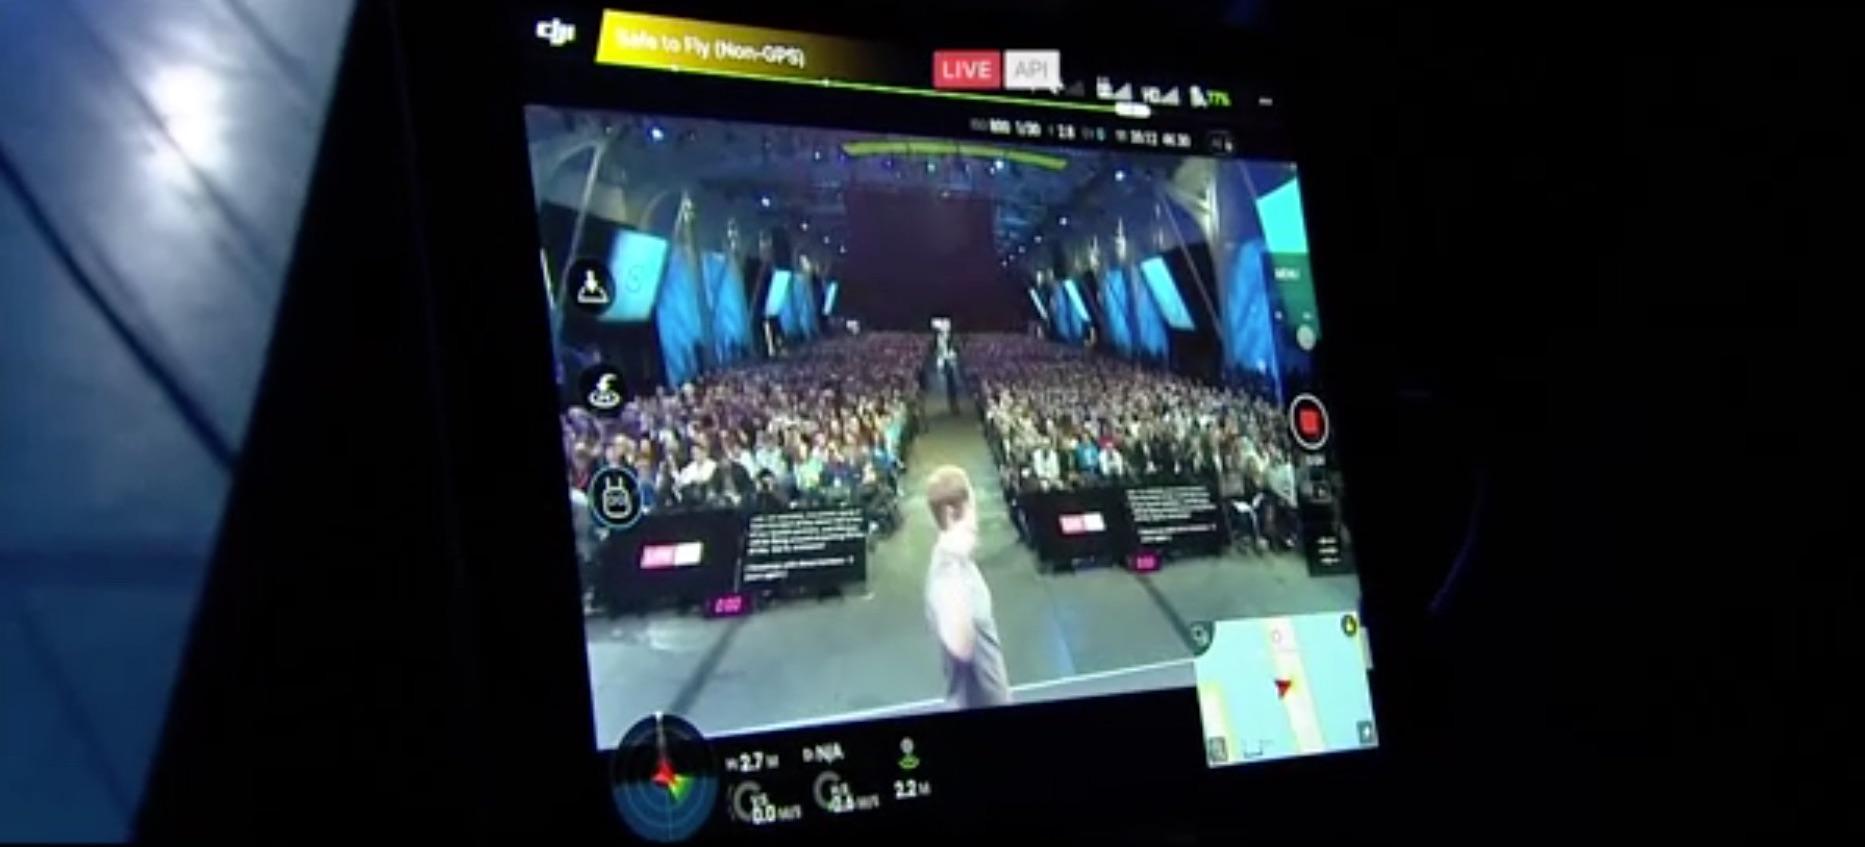 dji-facebook-live-